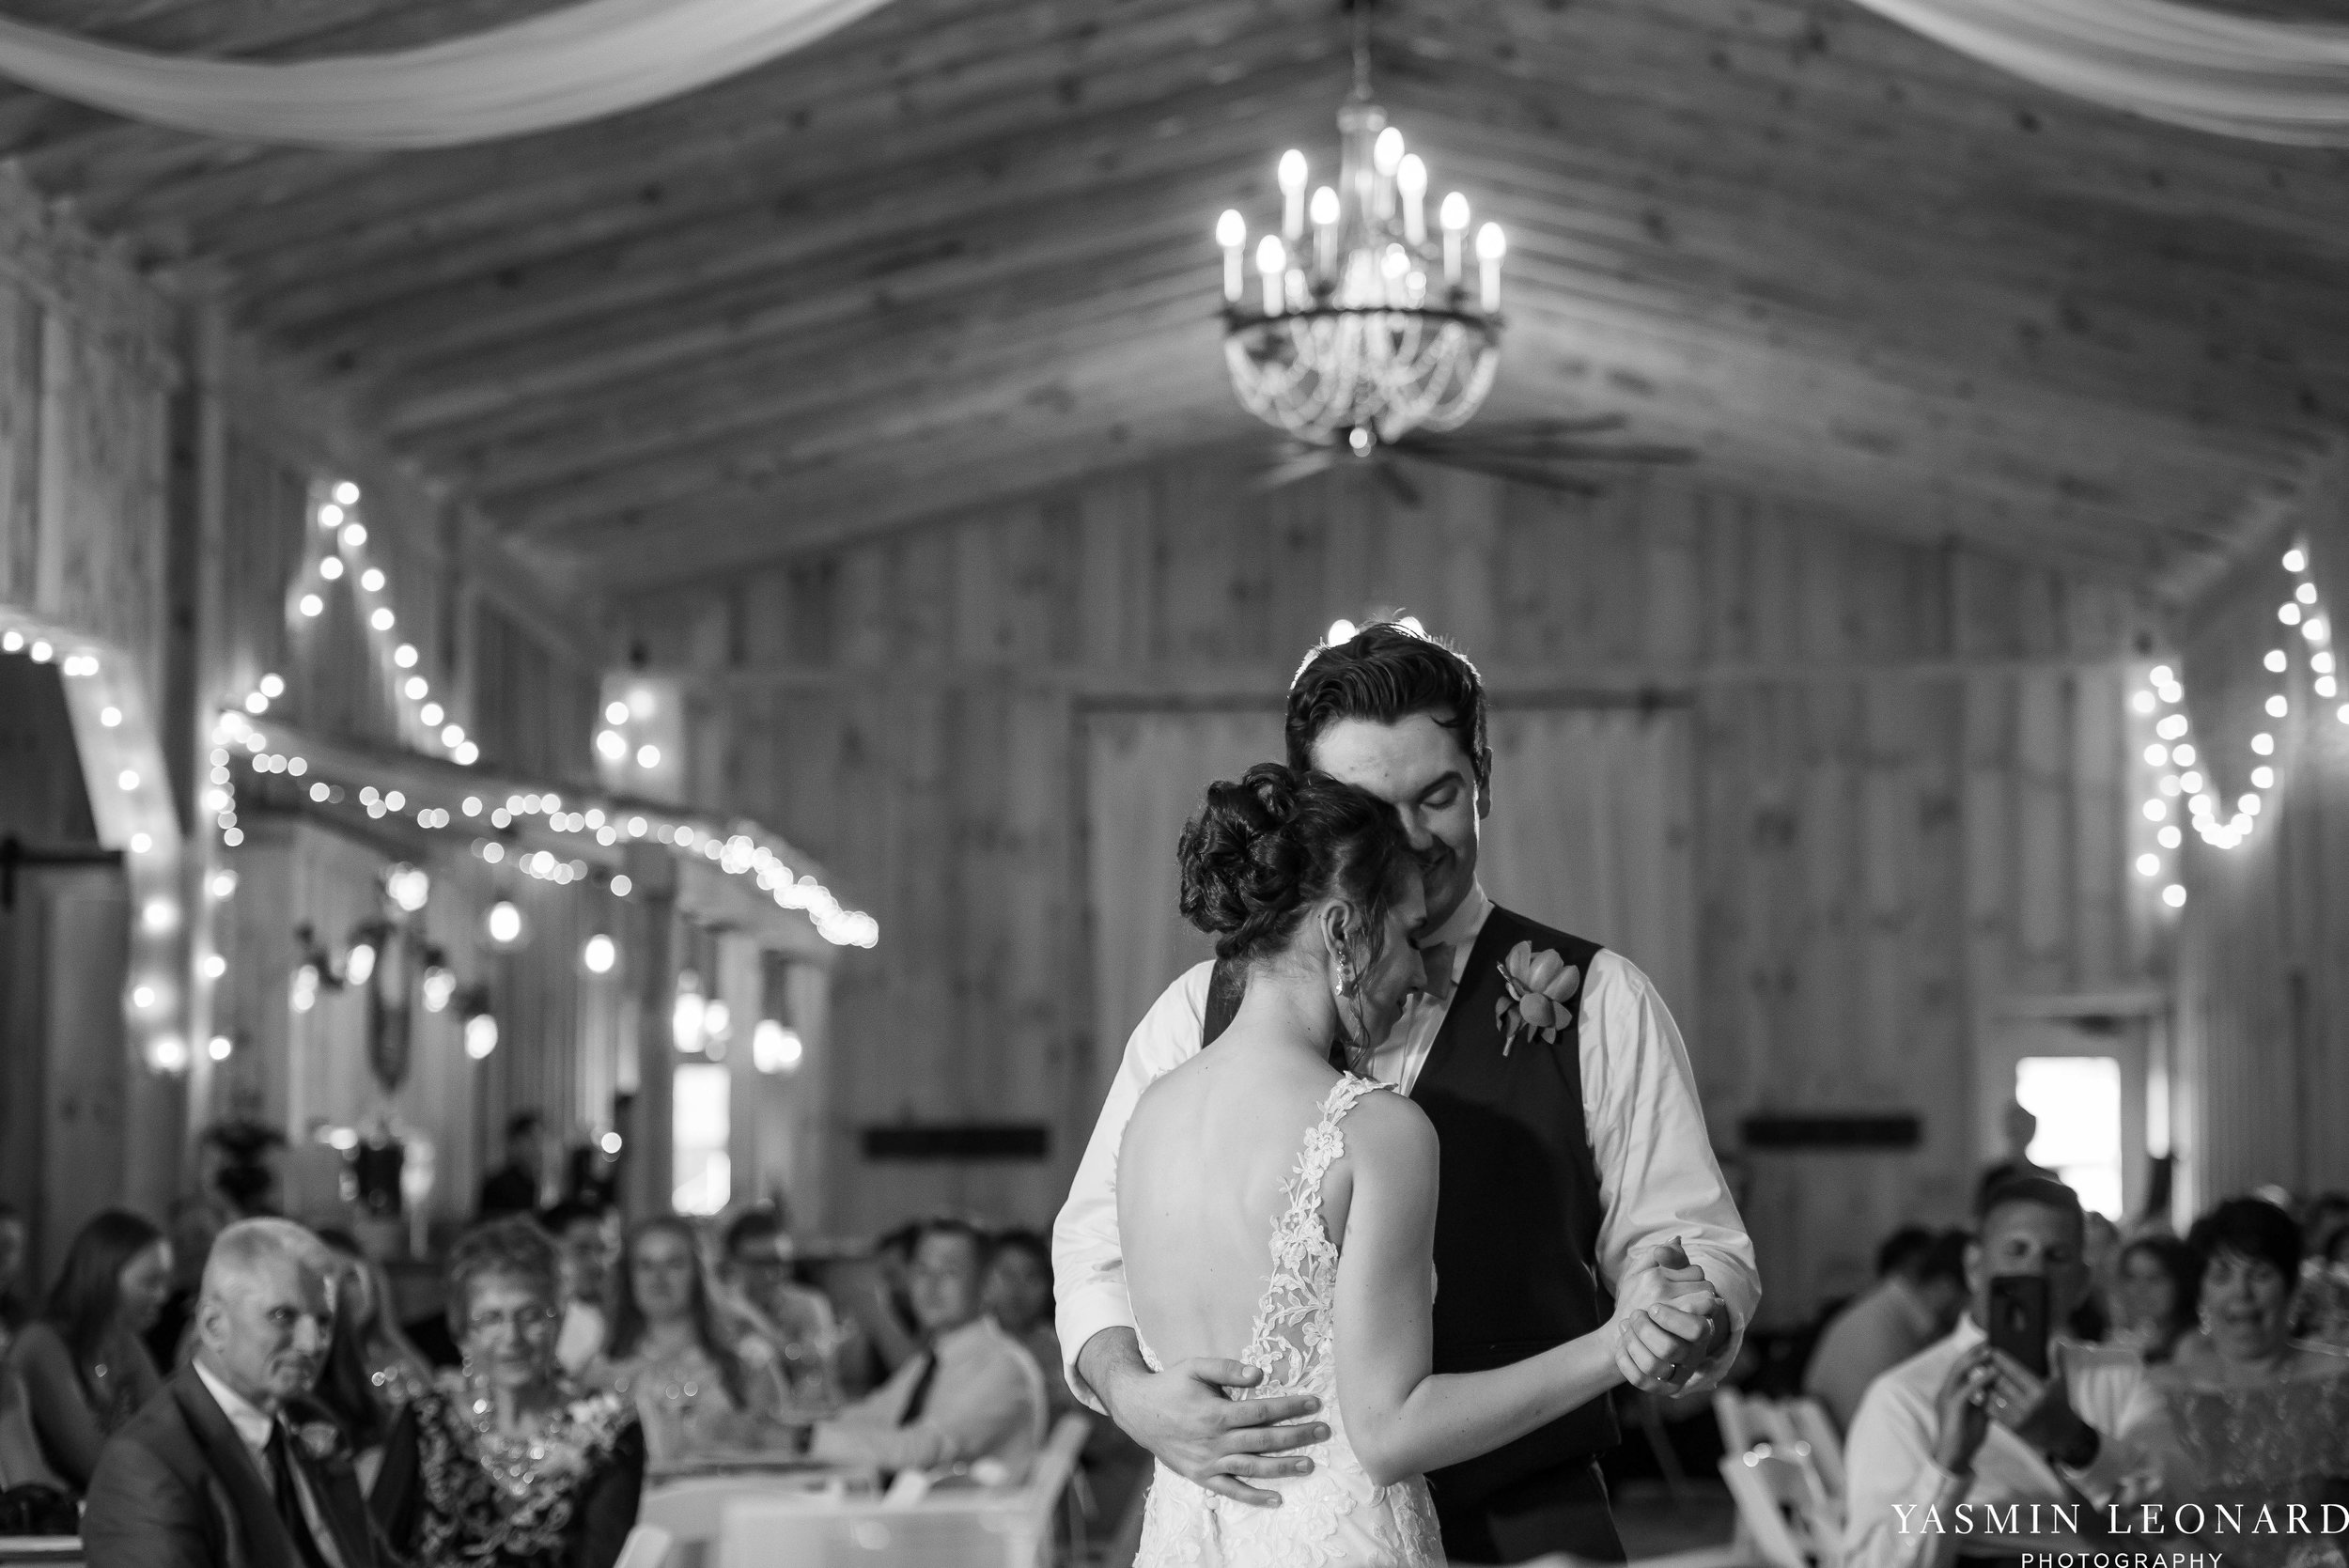 Old Homeplace Vineyard - NC Weddings - Outdoor Summer Weddings - Peony Boutique - Vineyard Wedding - NC Photographer - Yasmin Leonard Photography-51.jpg